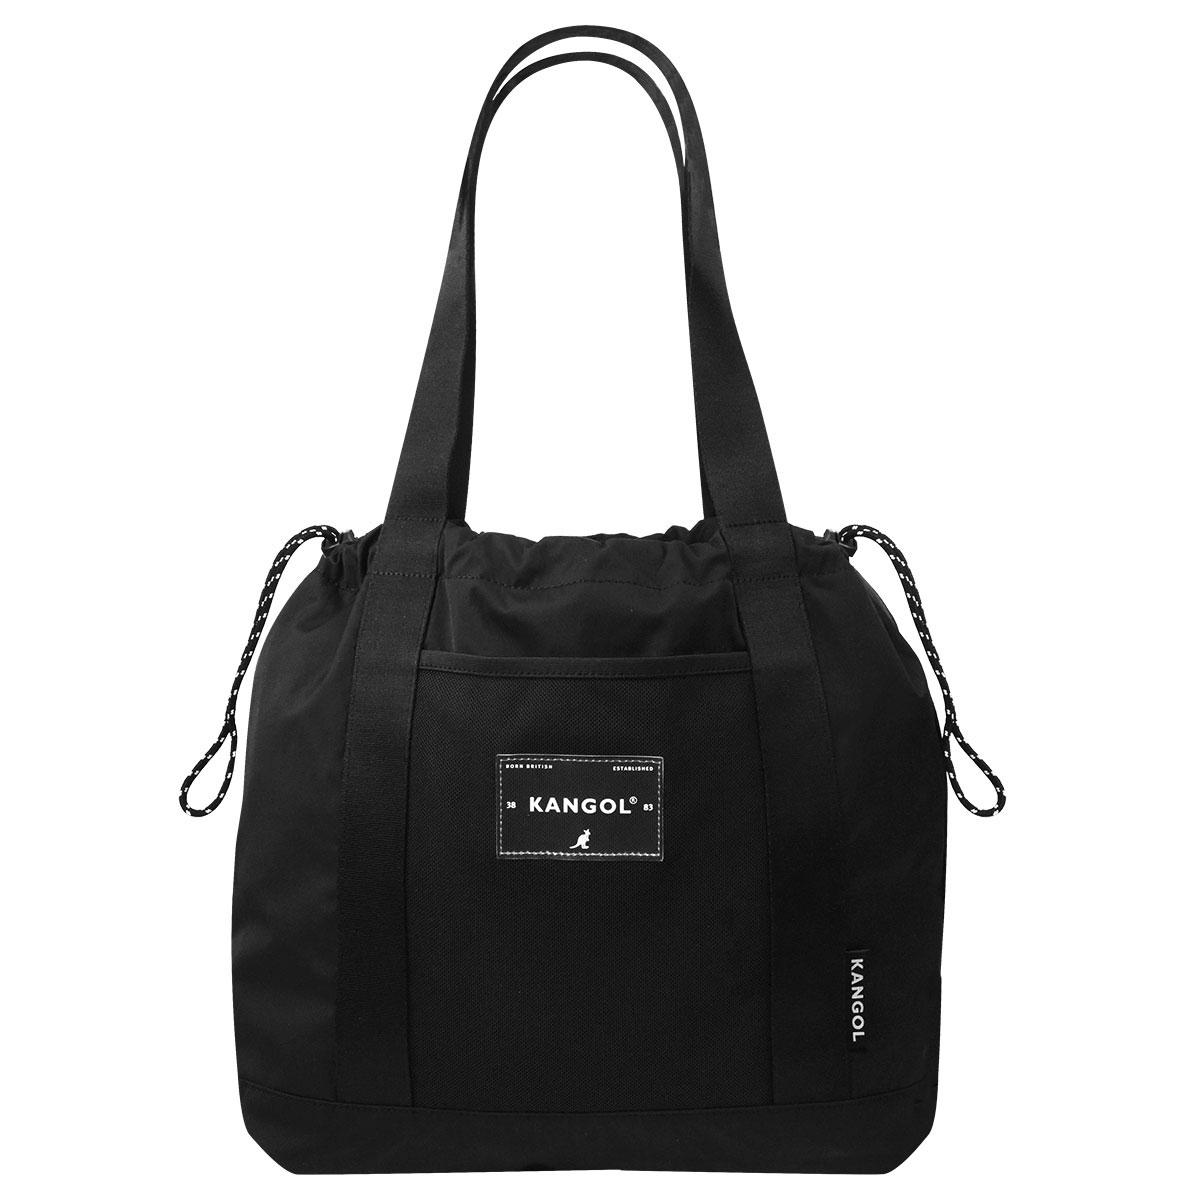 Kangol Casual Shopper in Black